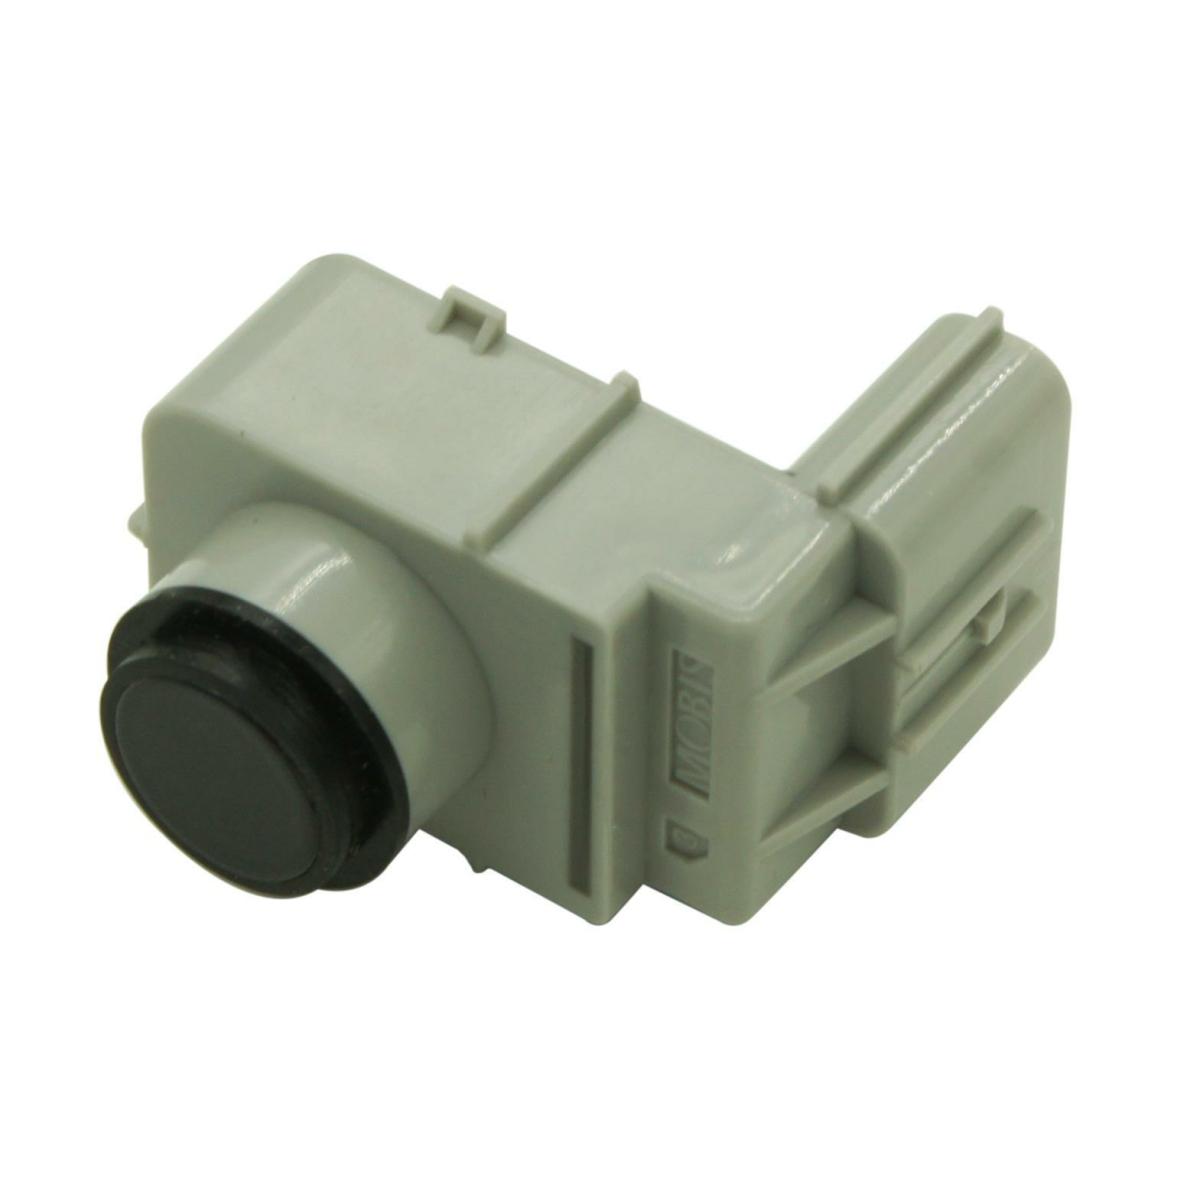 Park sensor 95720-A2001 for Hyundai PDC Parktronic